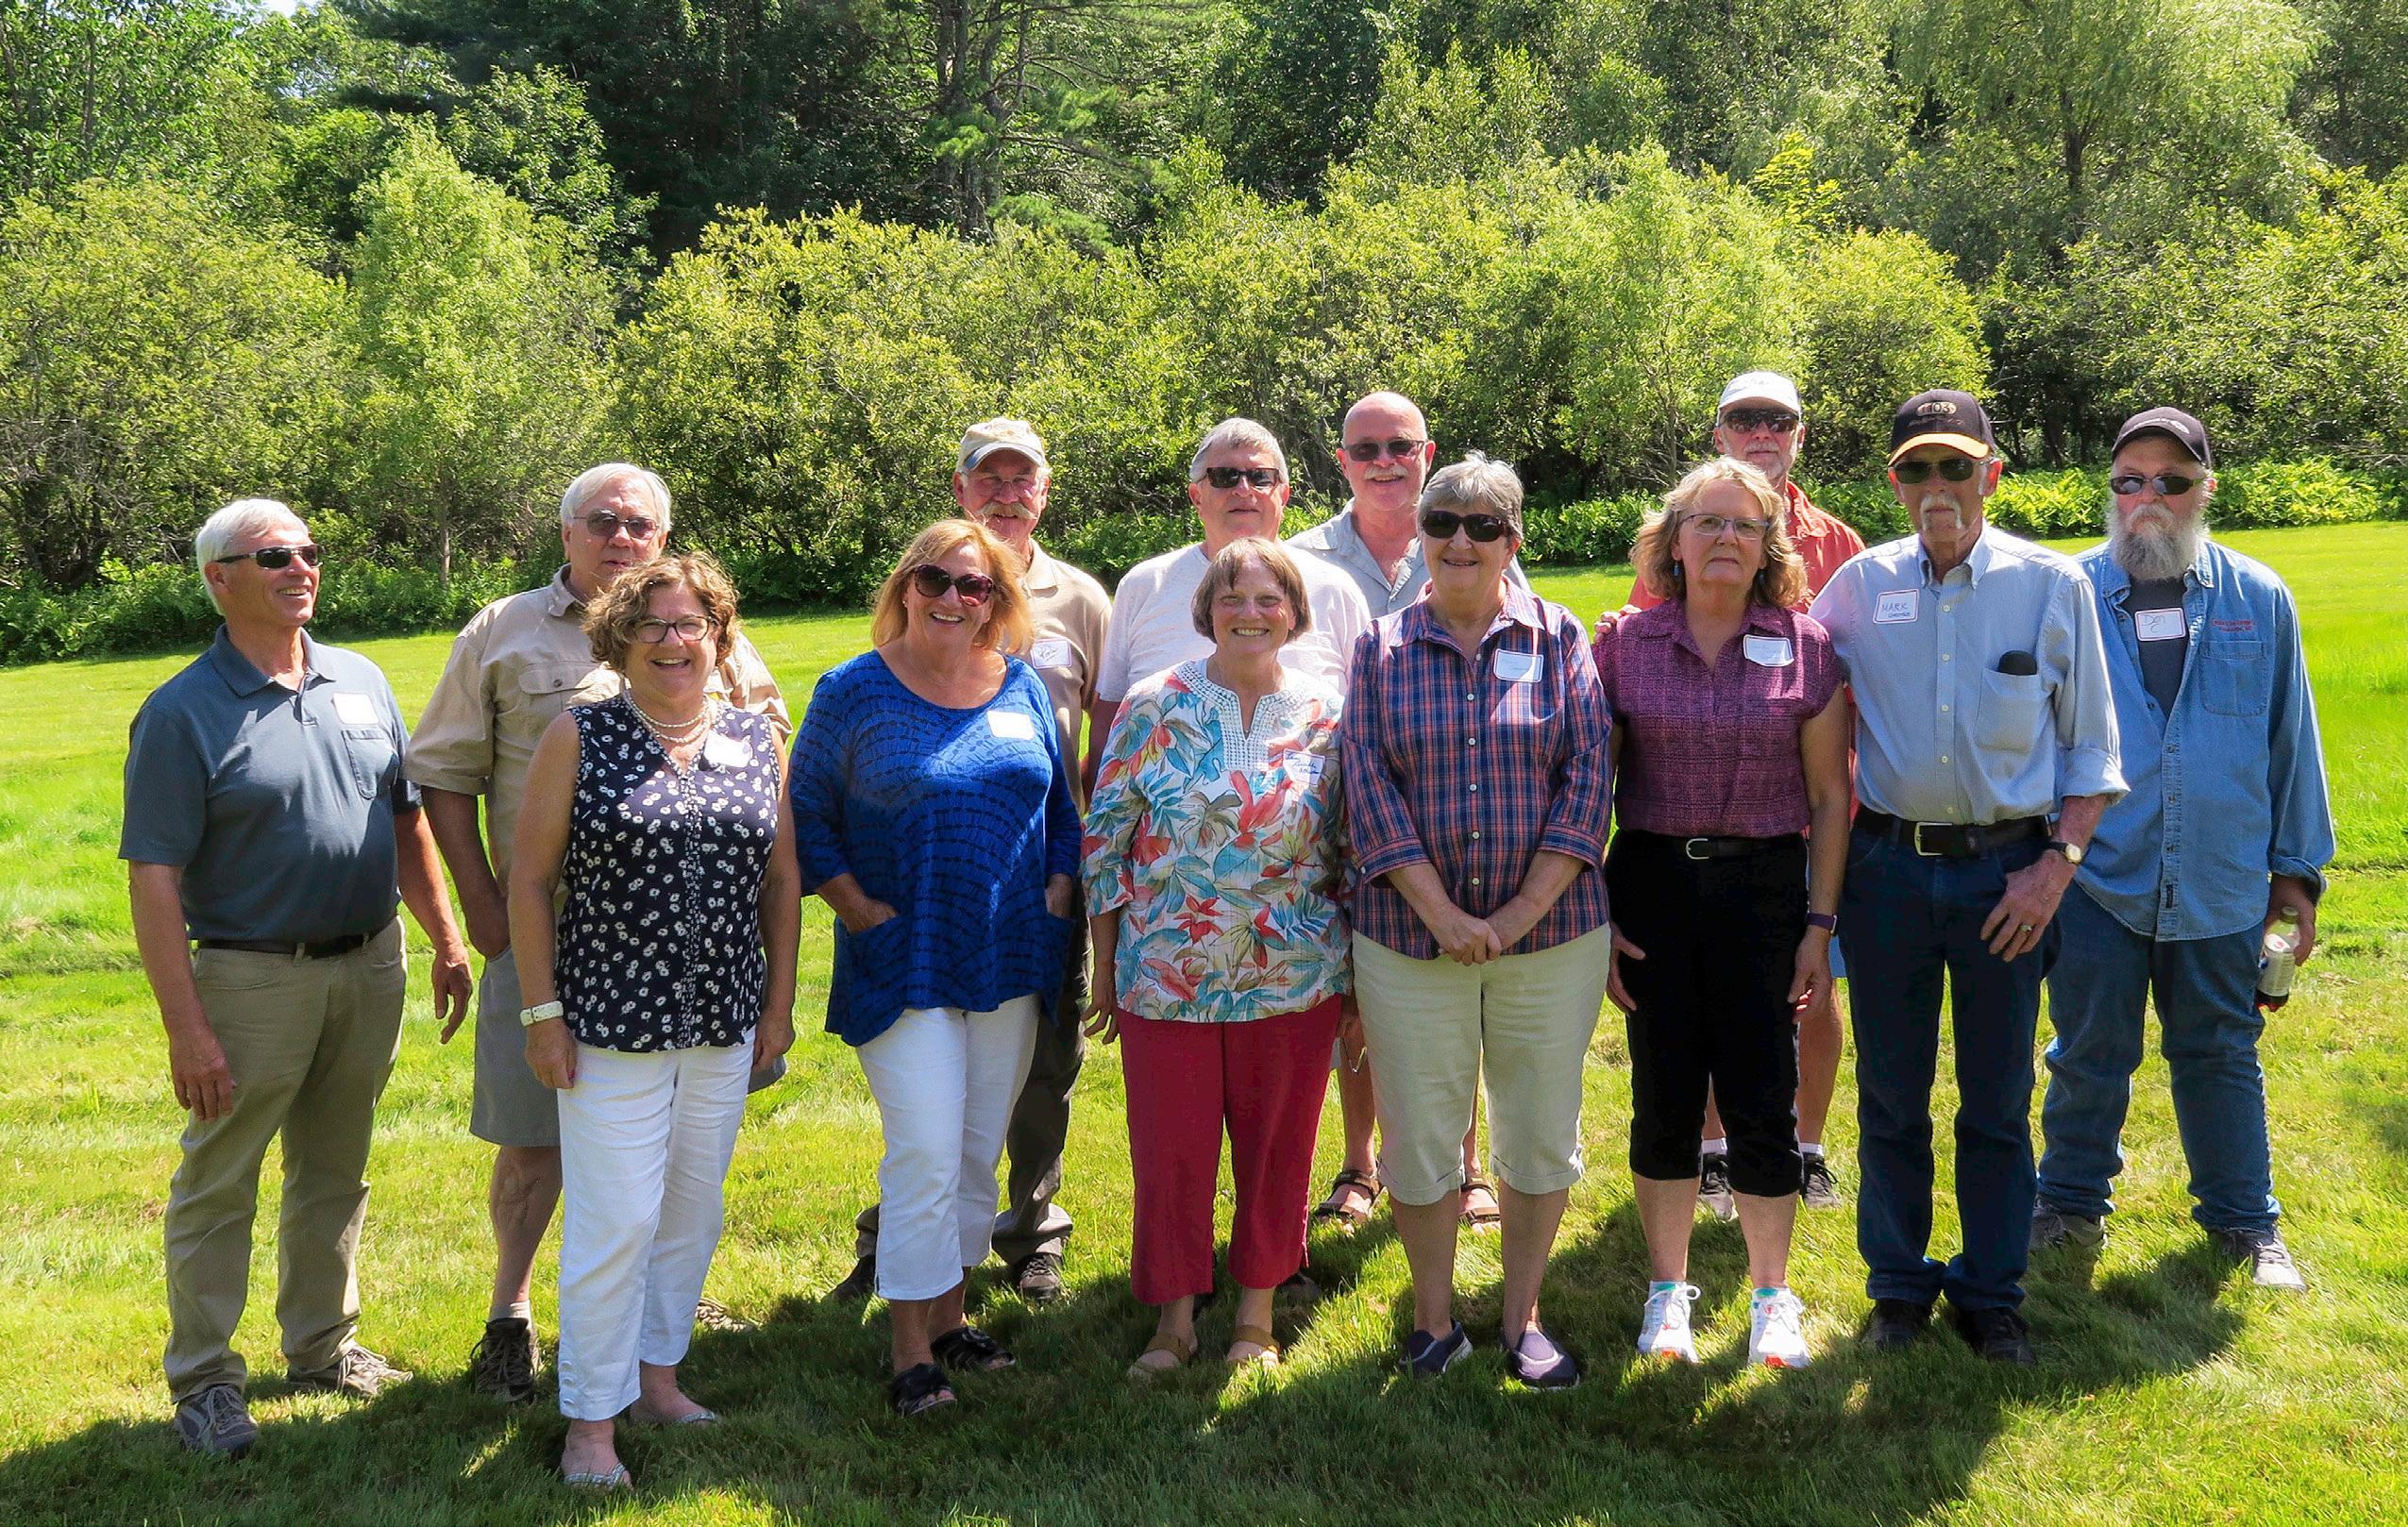 Page 10 of Alumni Reunions a Success